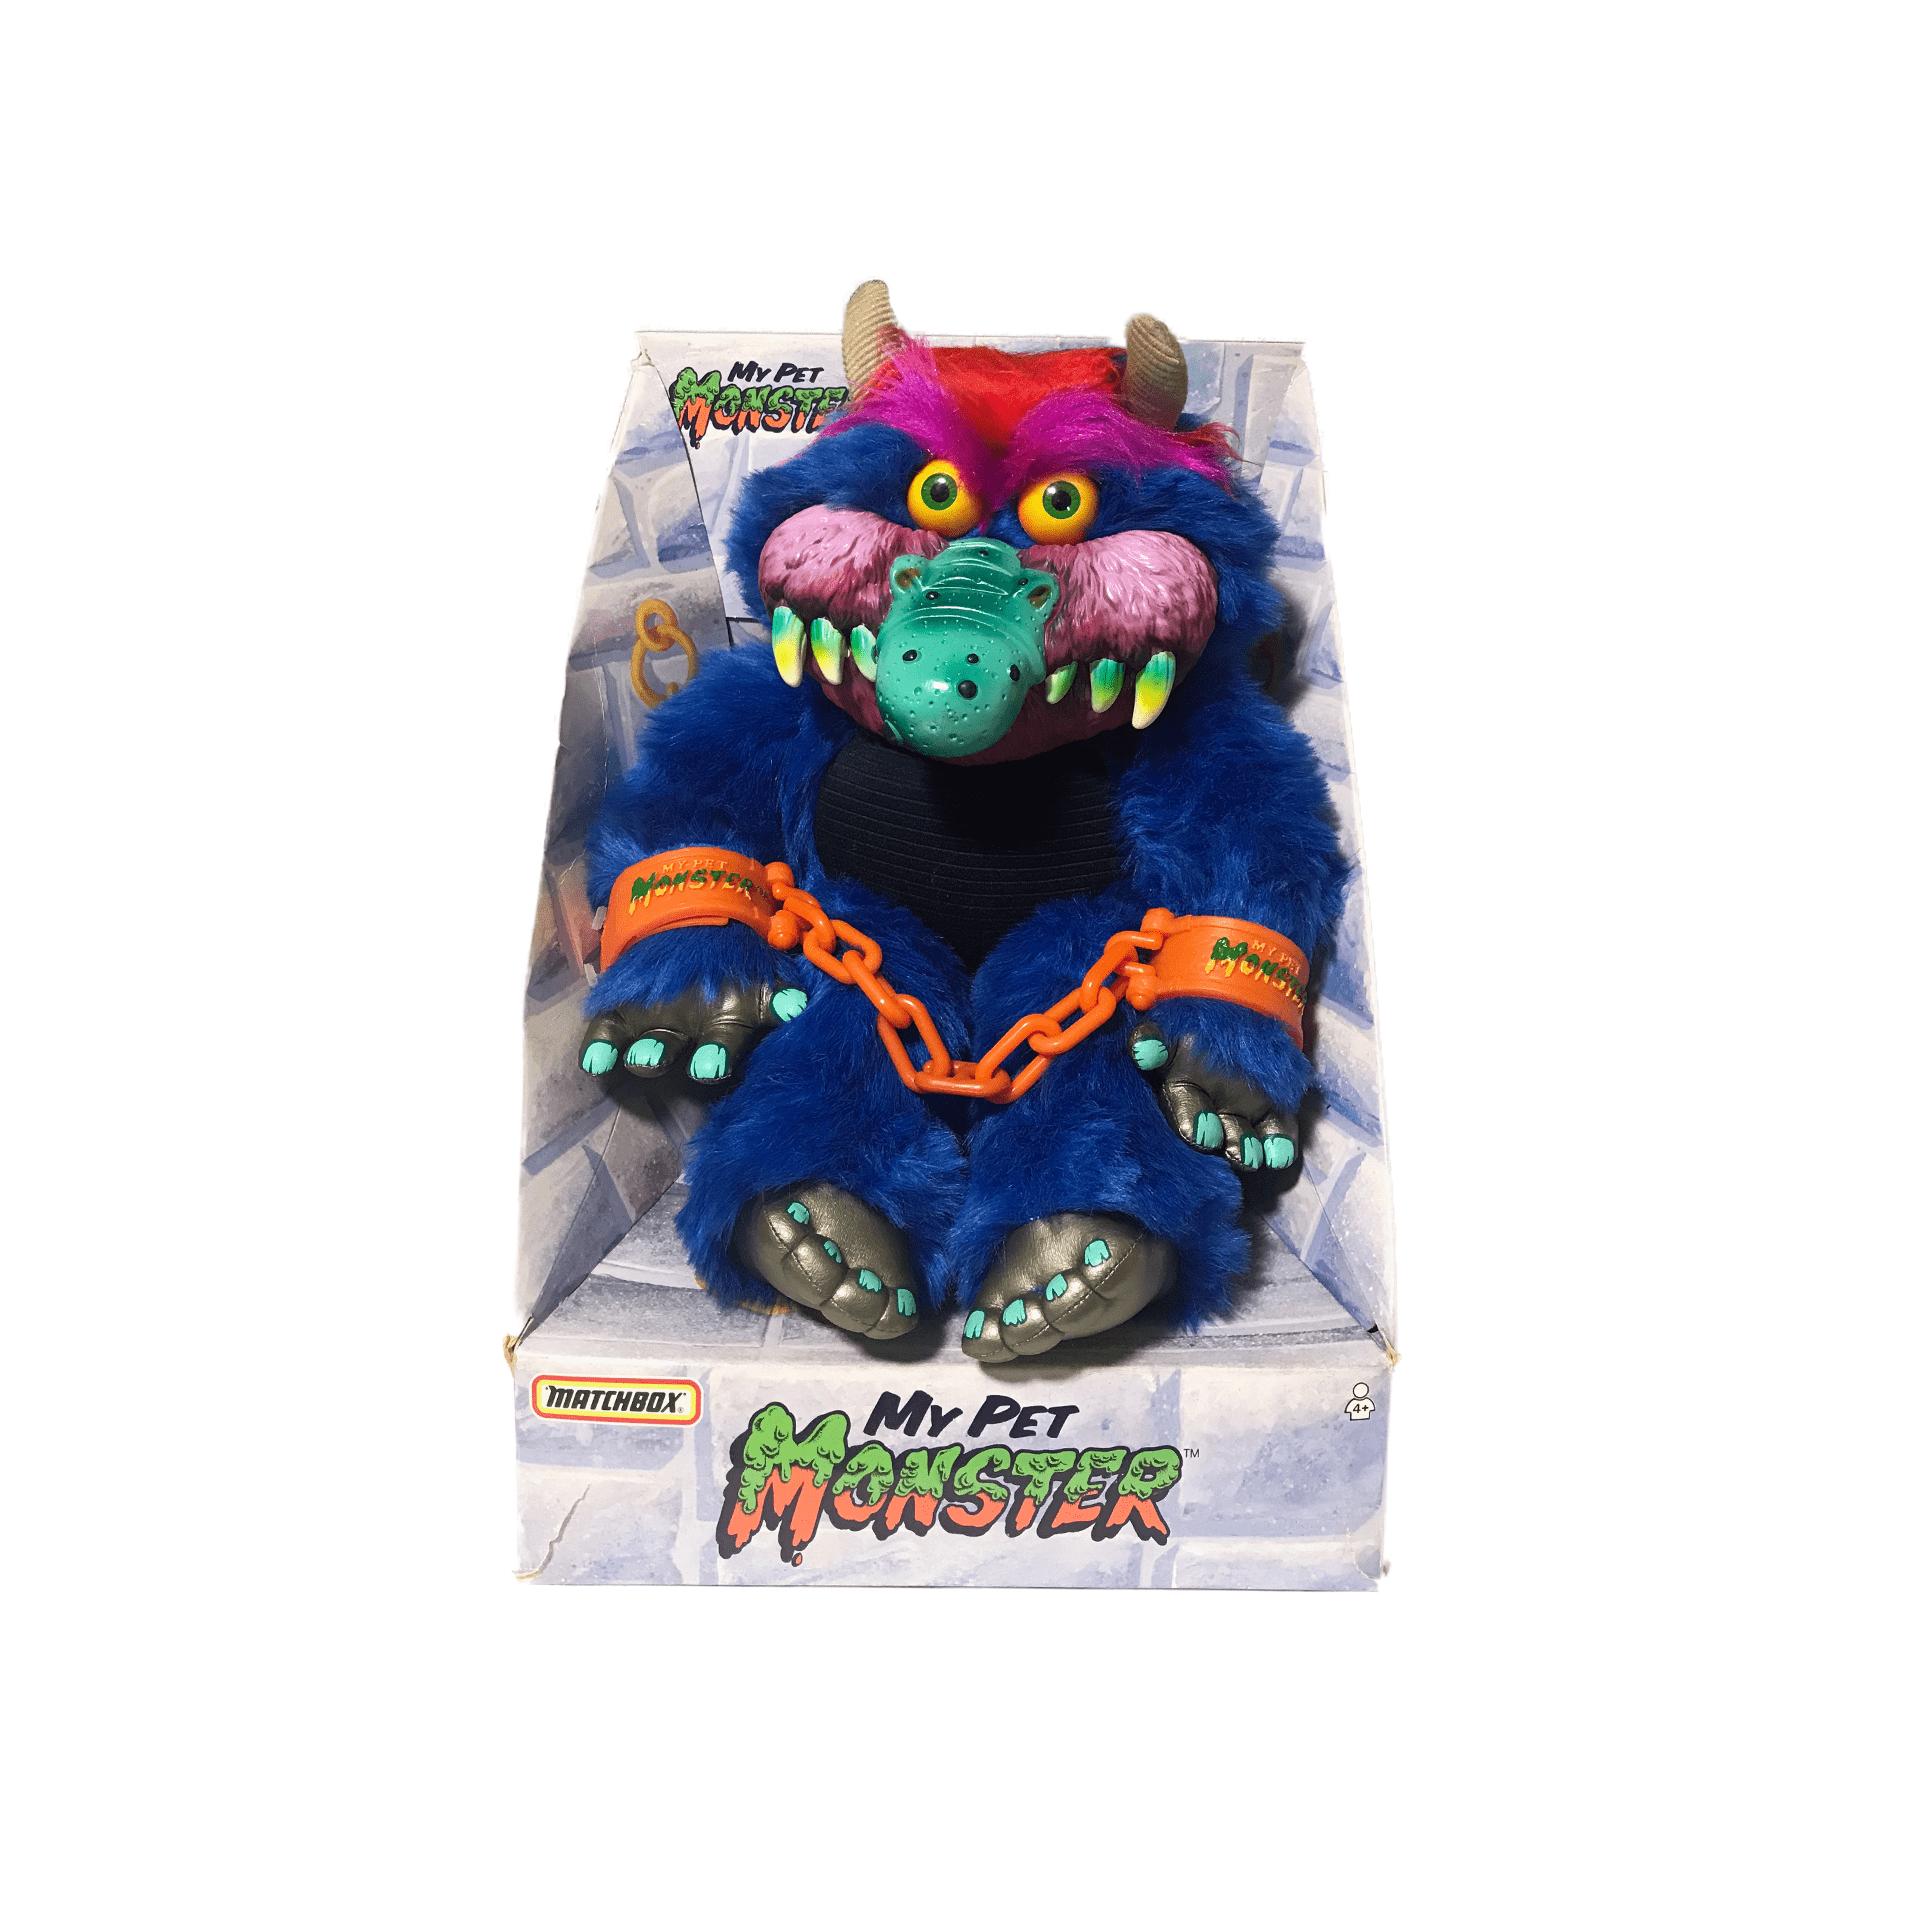 Monster Russet Burbank